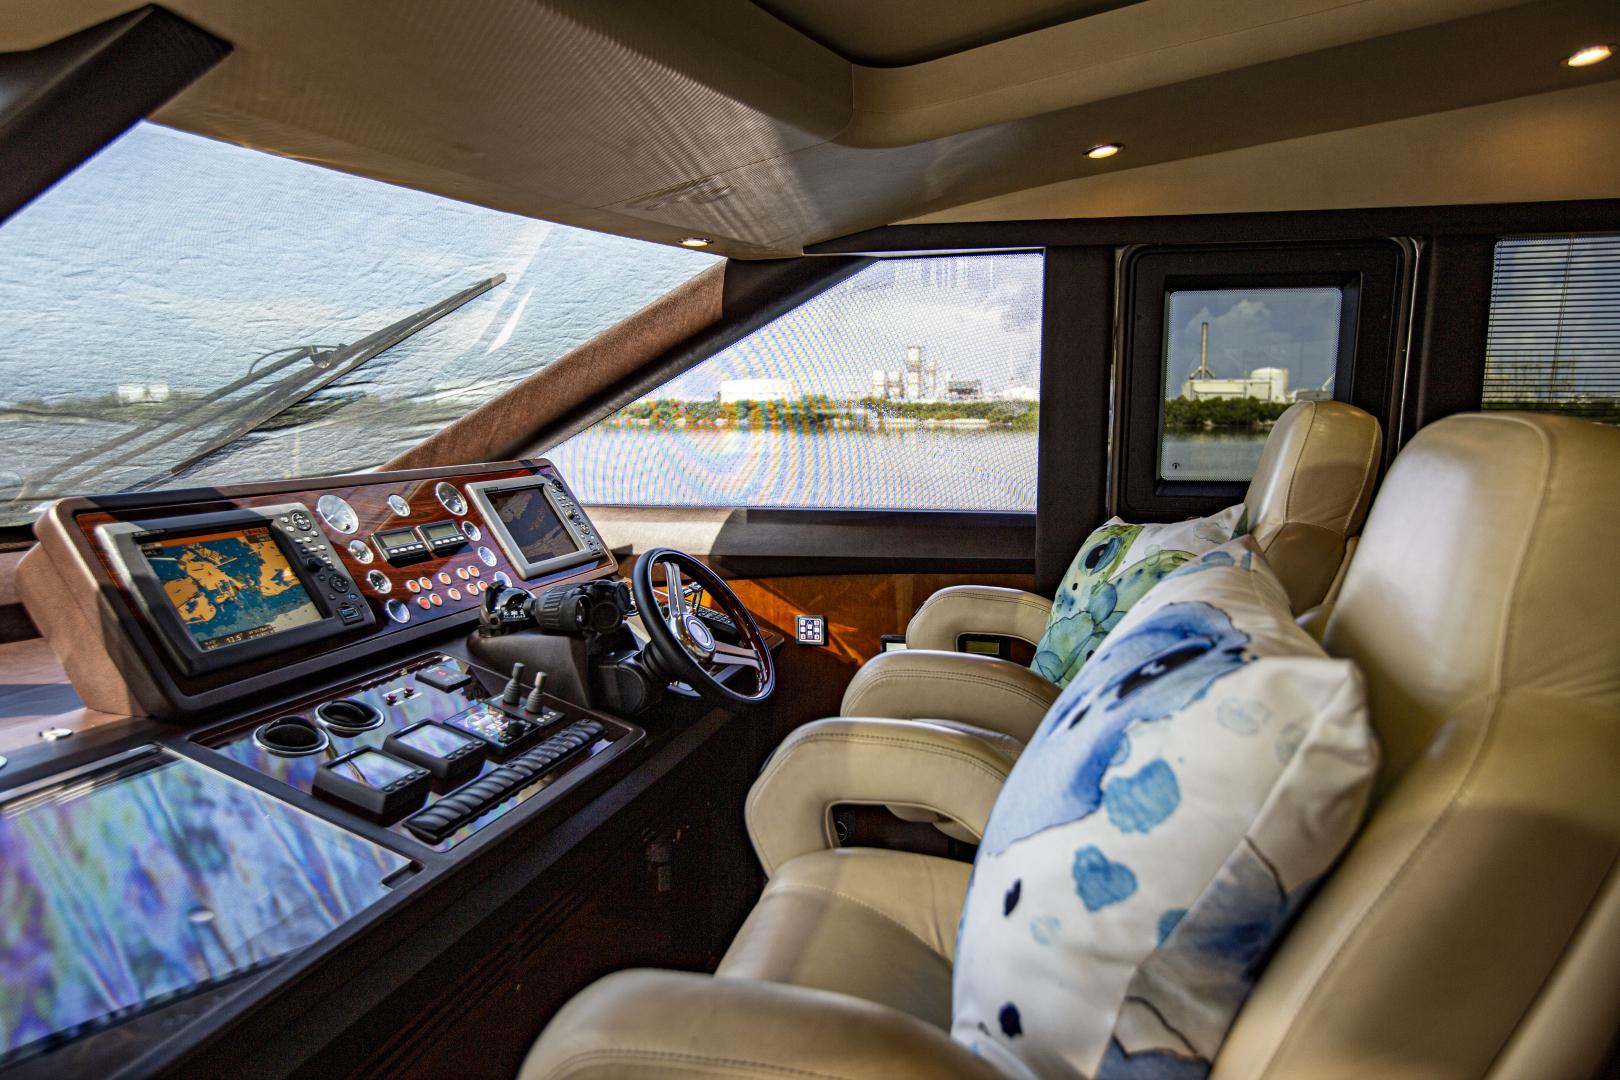 Viking Princess-V85 2009-Las Brisas Fort Lauderdale-Florida-United States-1365509 | Thumbnail